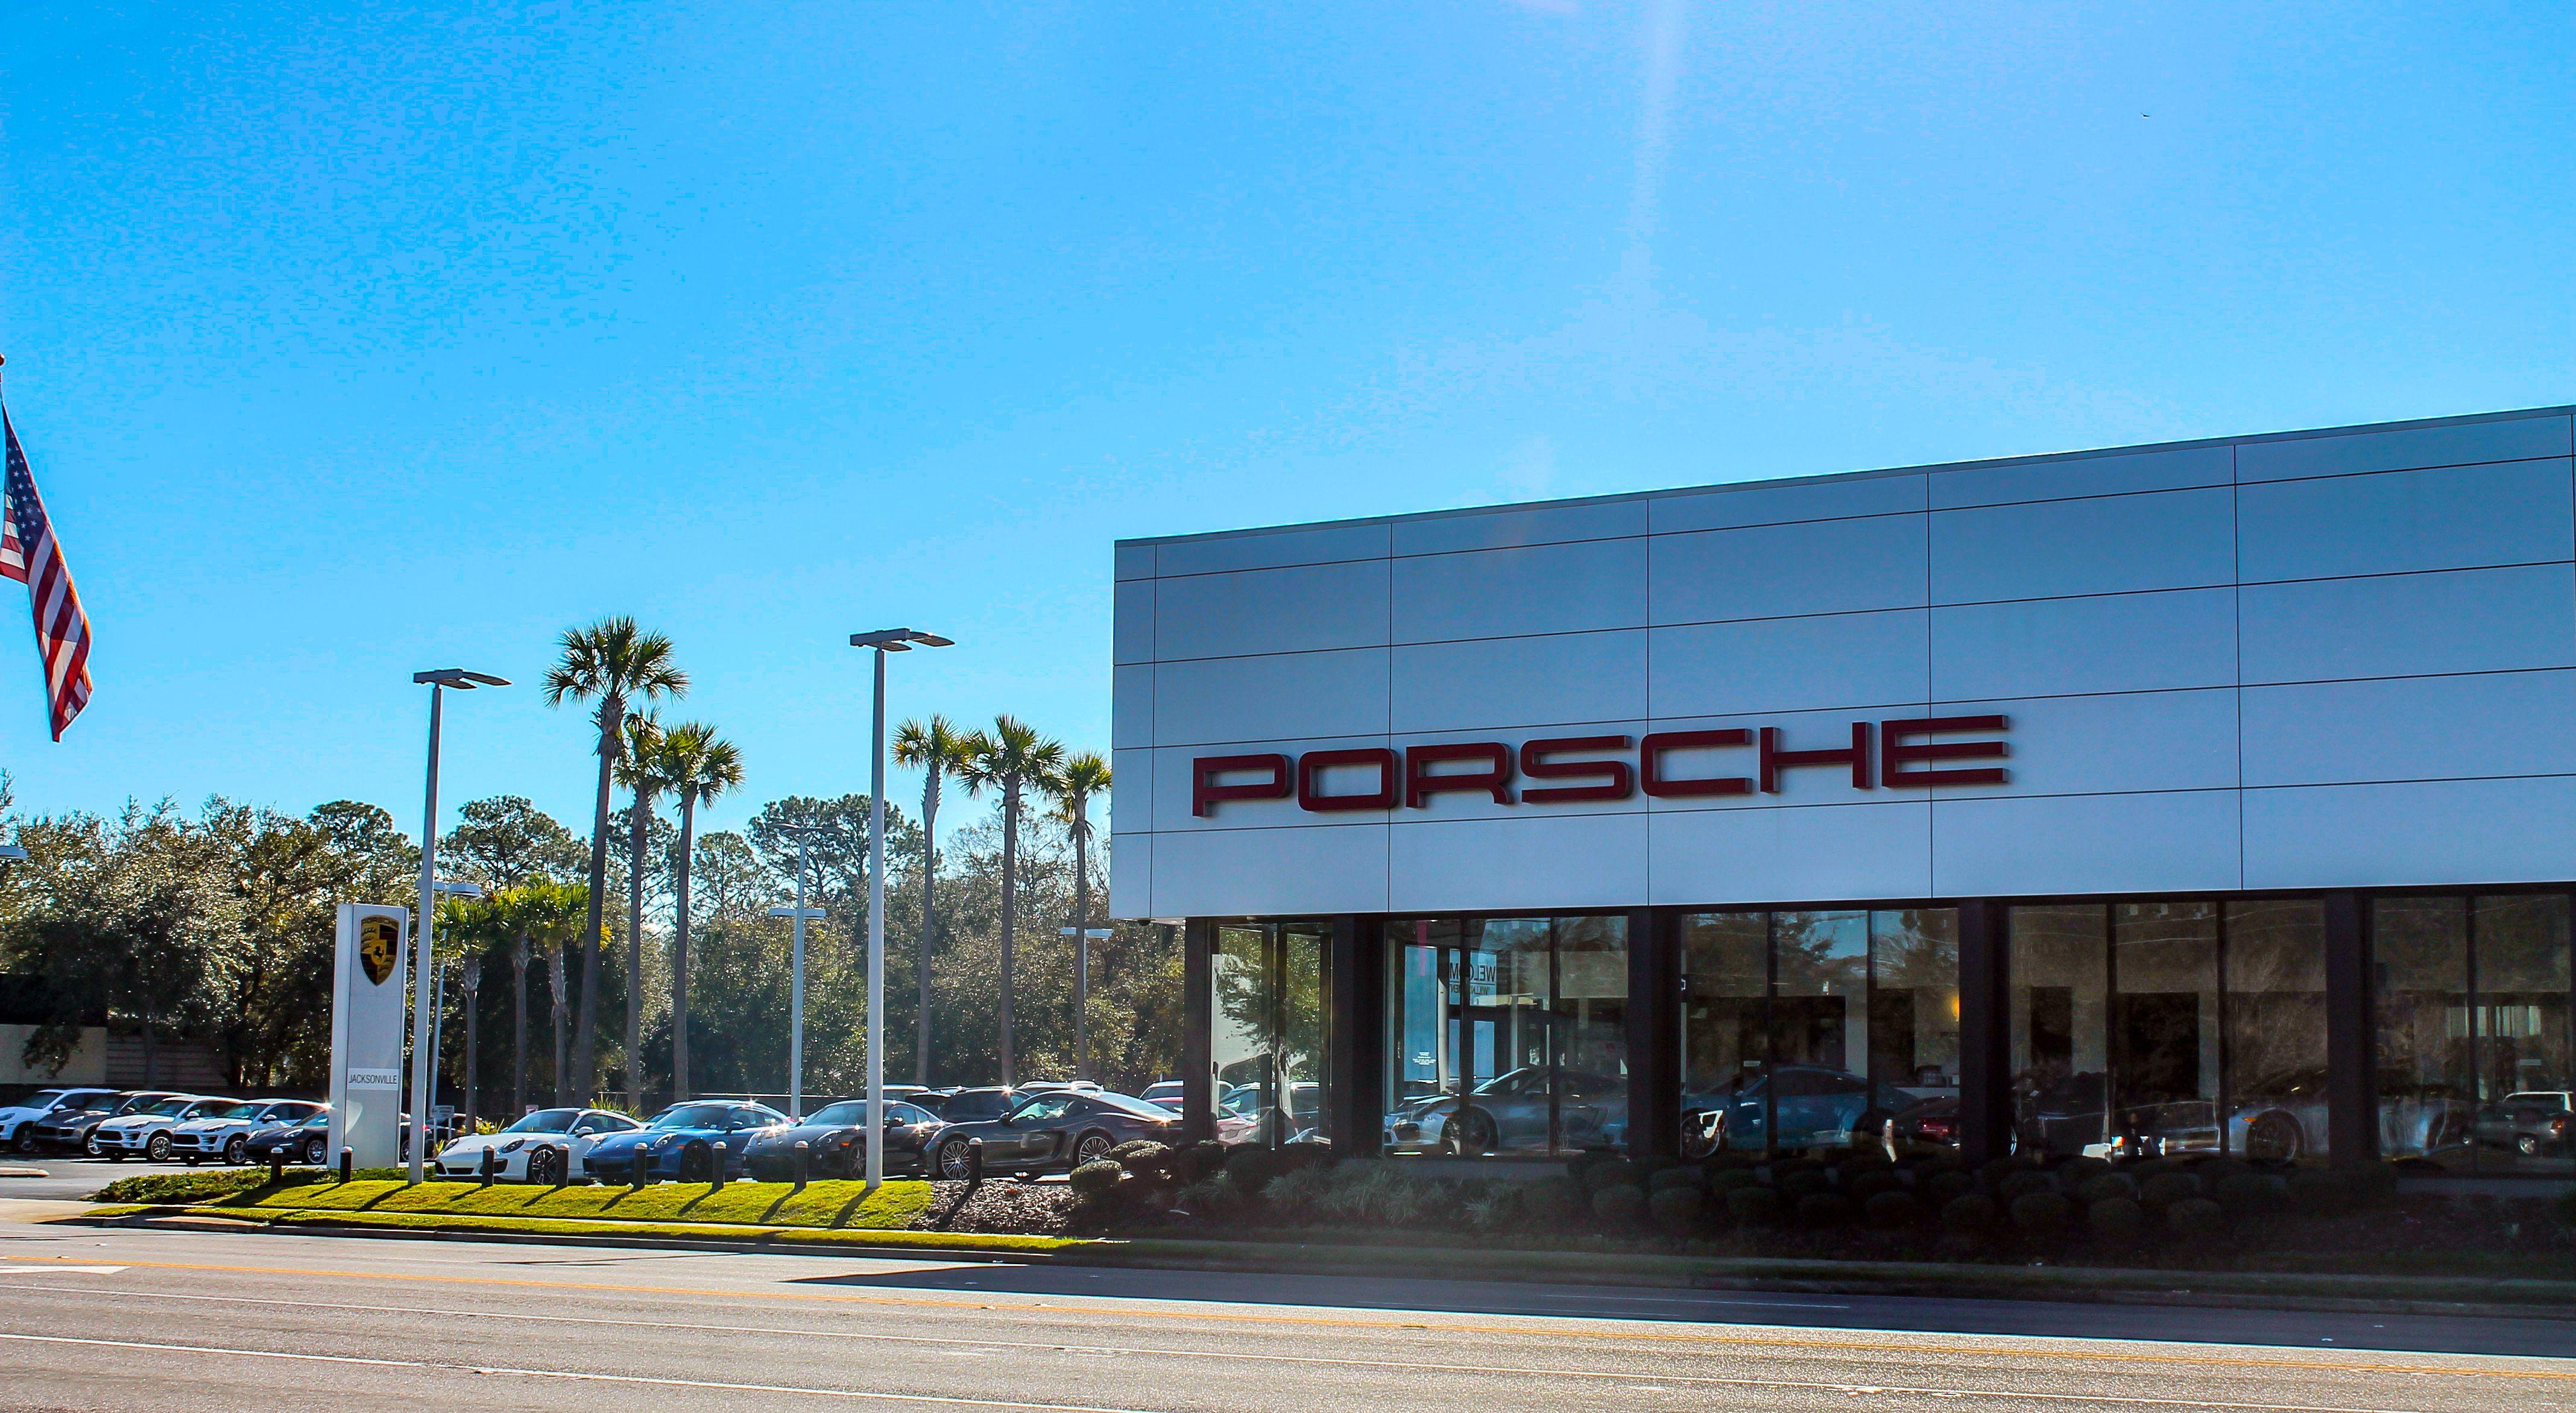 Visit Porsche Jacksonville Today At 10100 Atlantic Blvd Jacksonville Florida 32225 For More Information Contact Jacksonville Porsche Dealership New Porsche